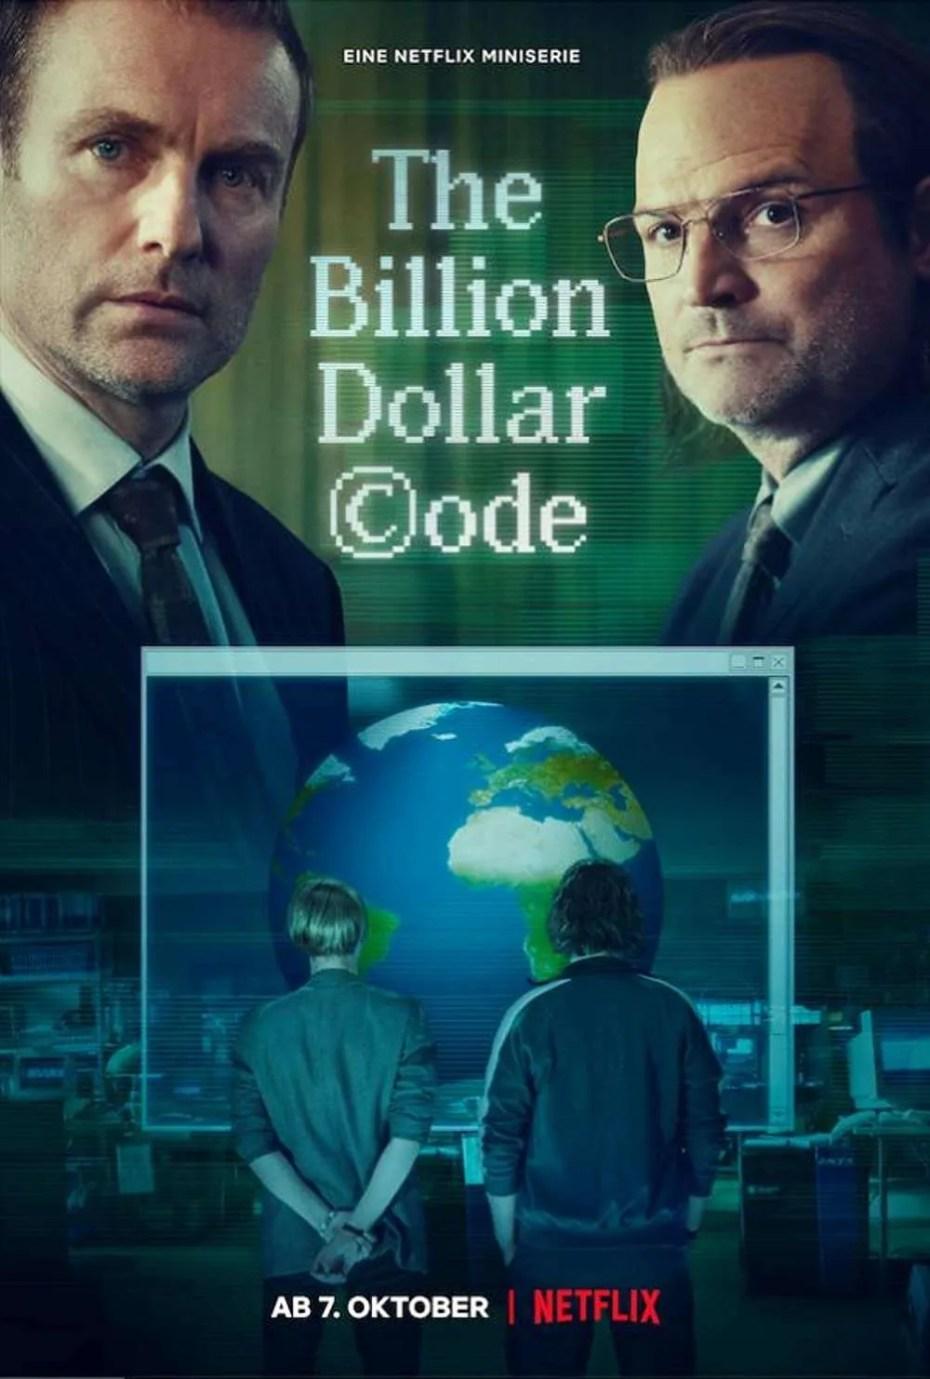 Le code à un milliard de dollars